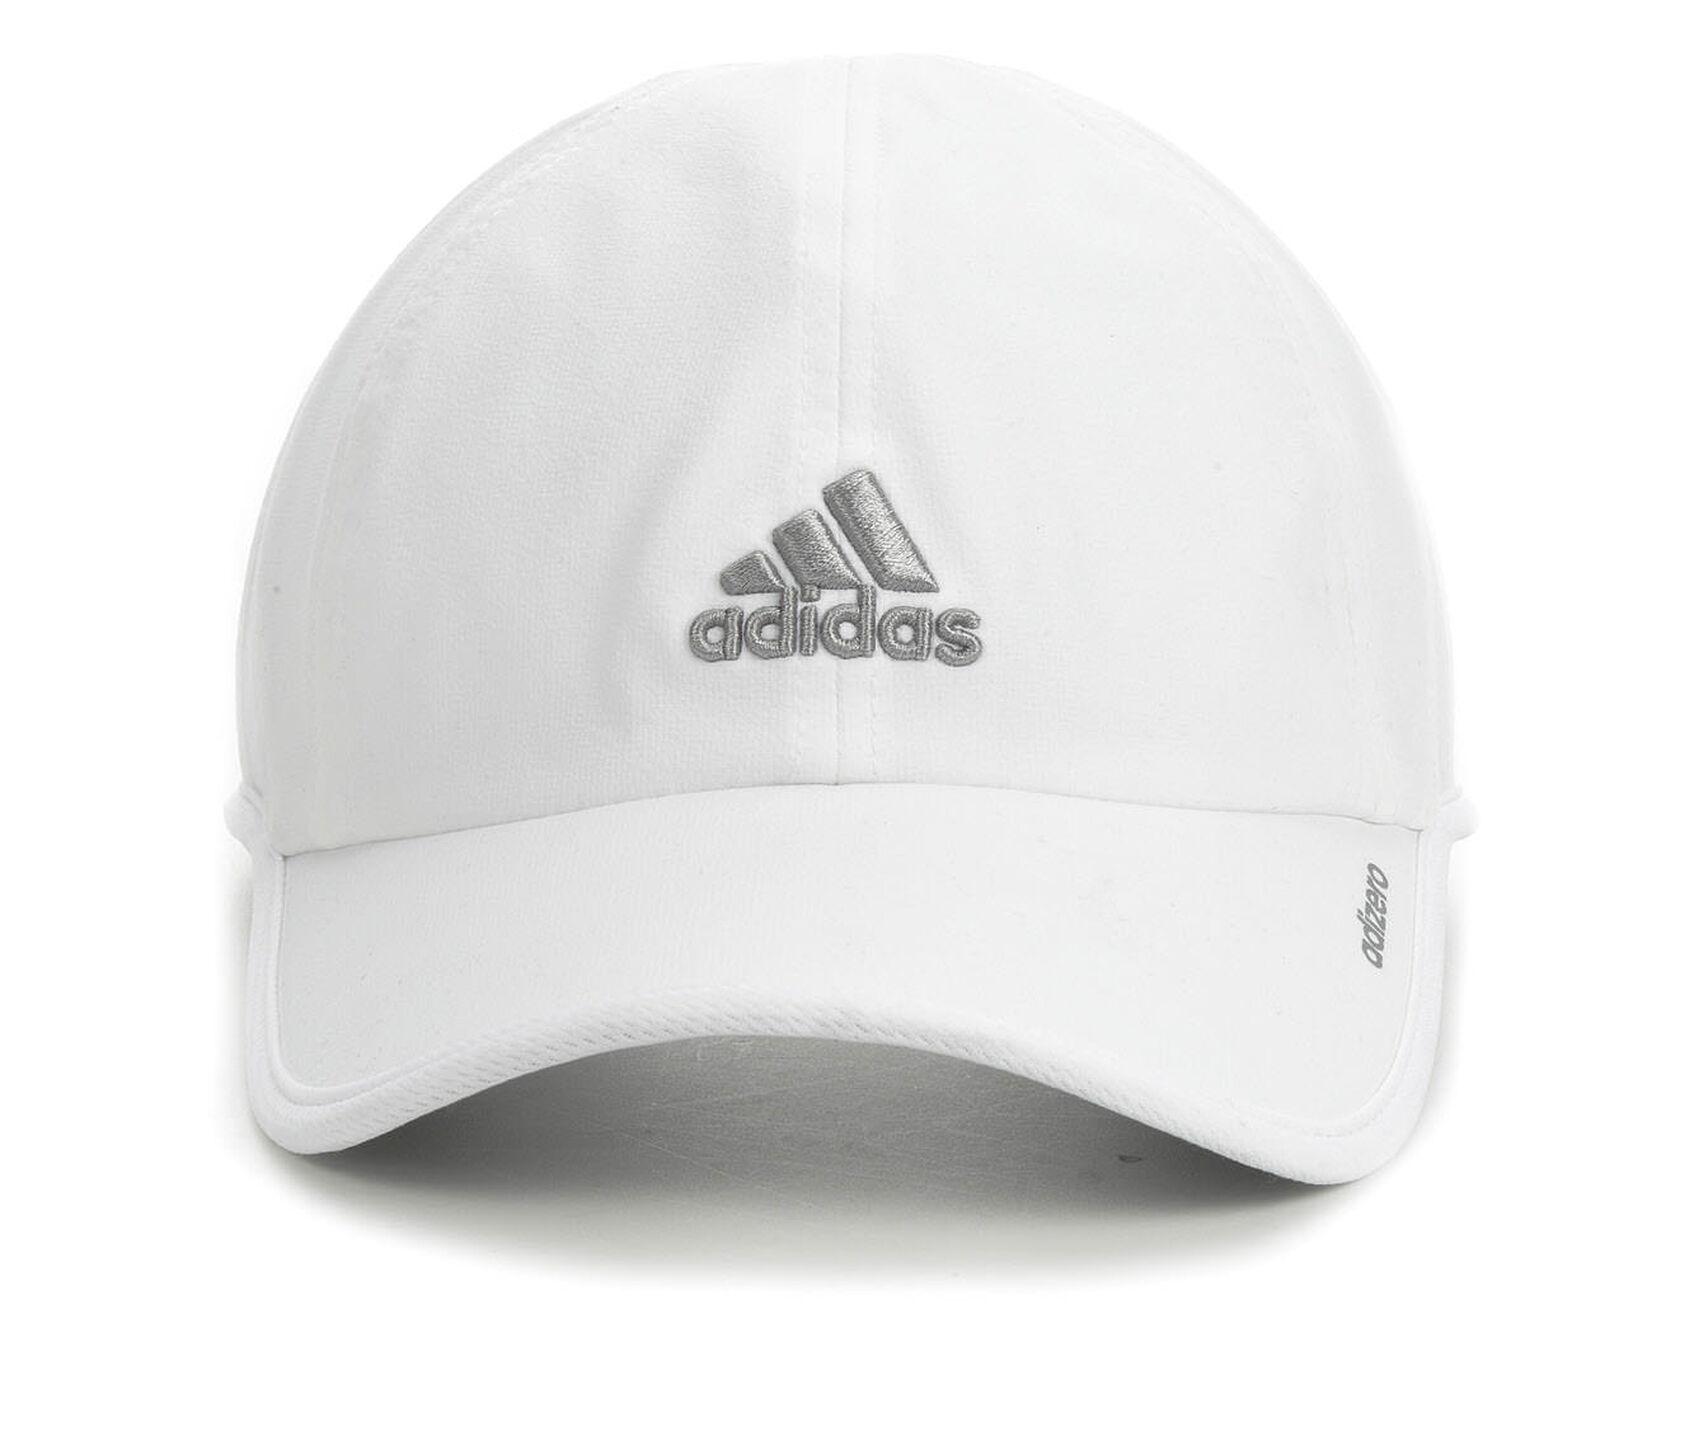 6d486f6f Adidas Adizero II Baseball Cap | Shoe Carnival